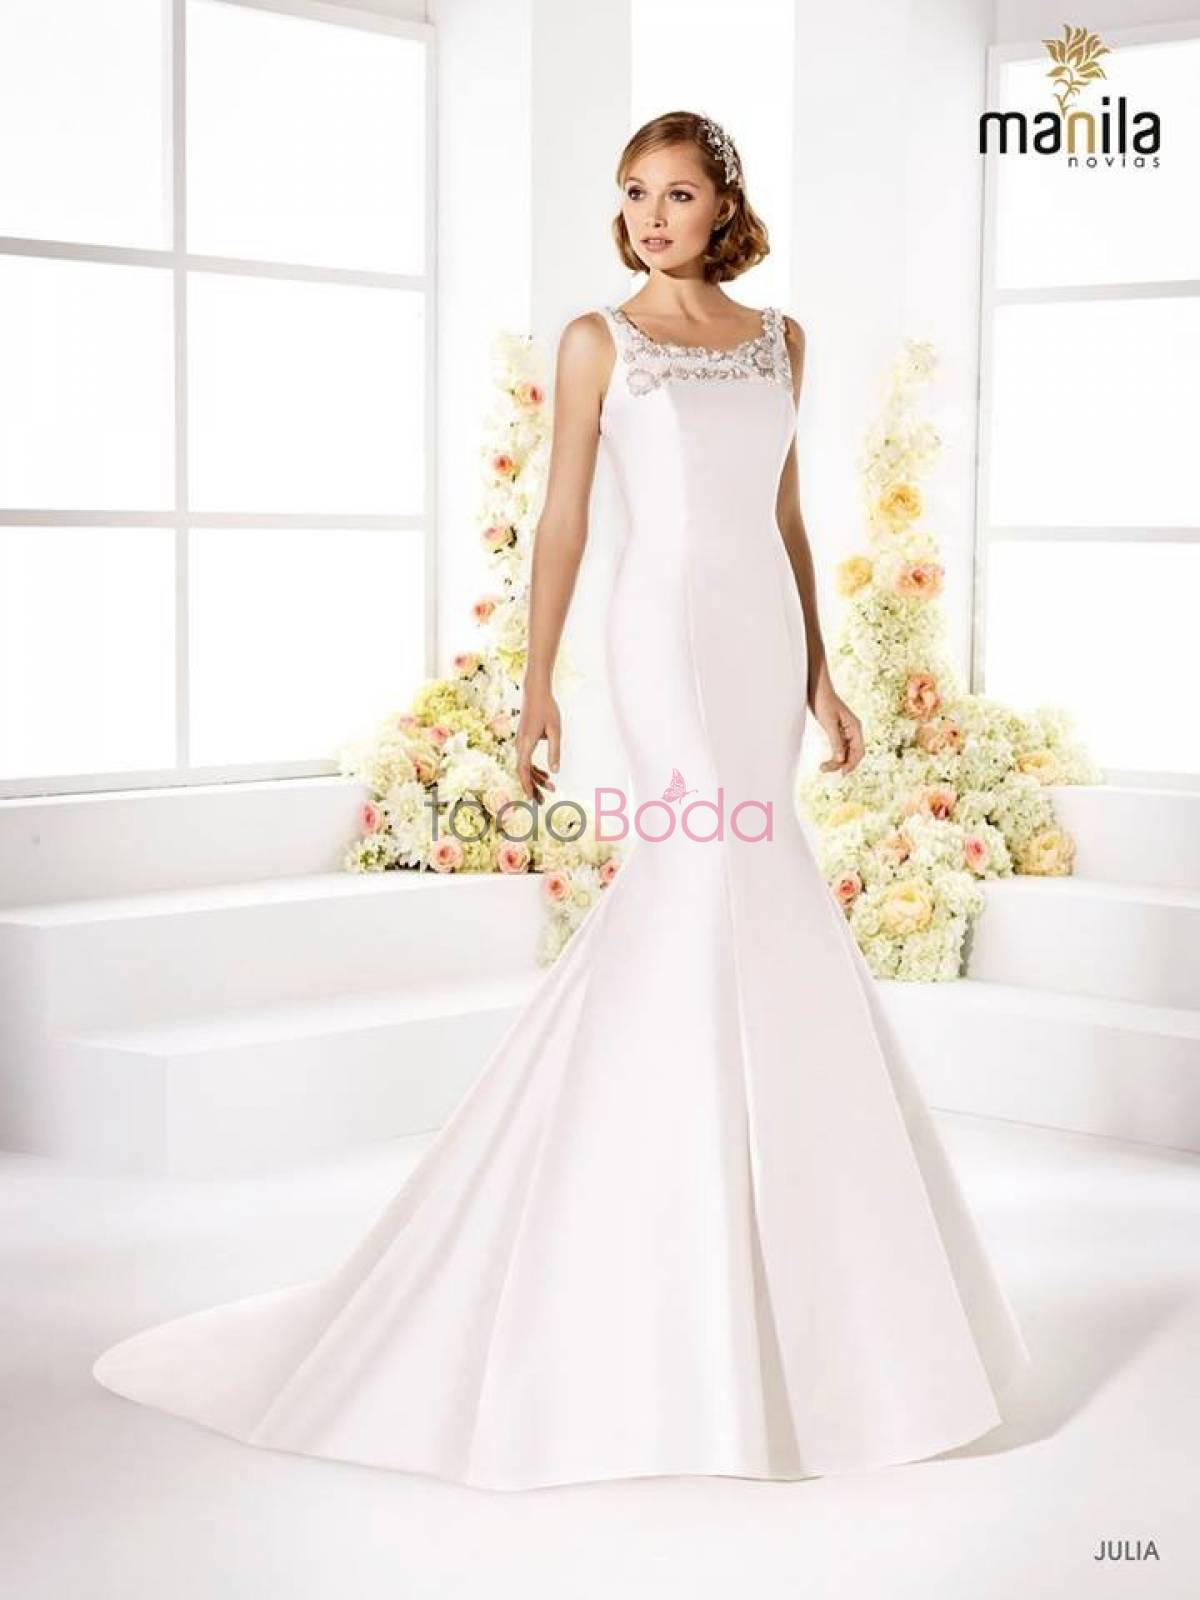 Vestidos de fiesta manila novias